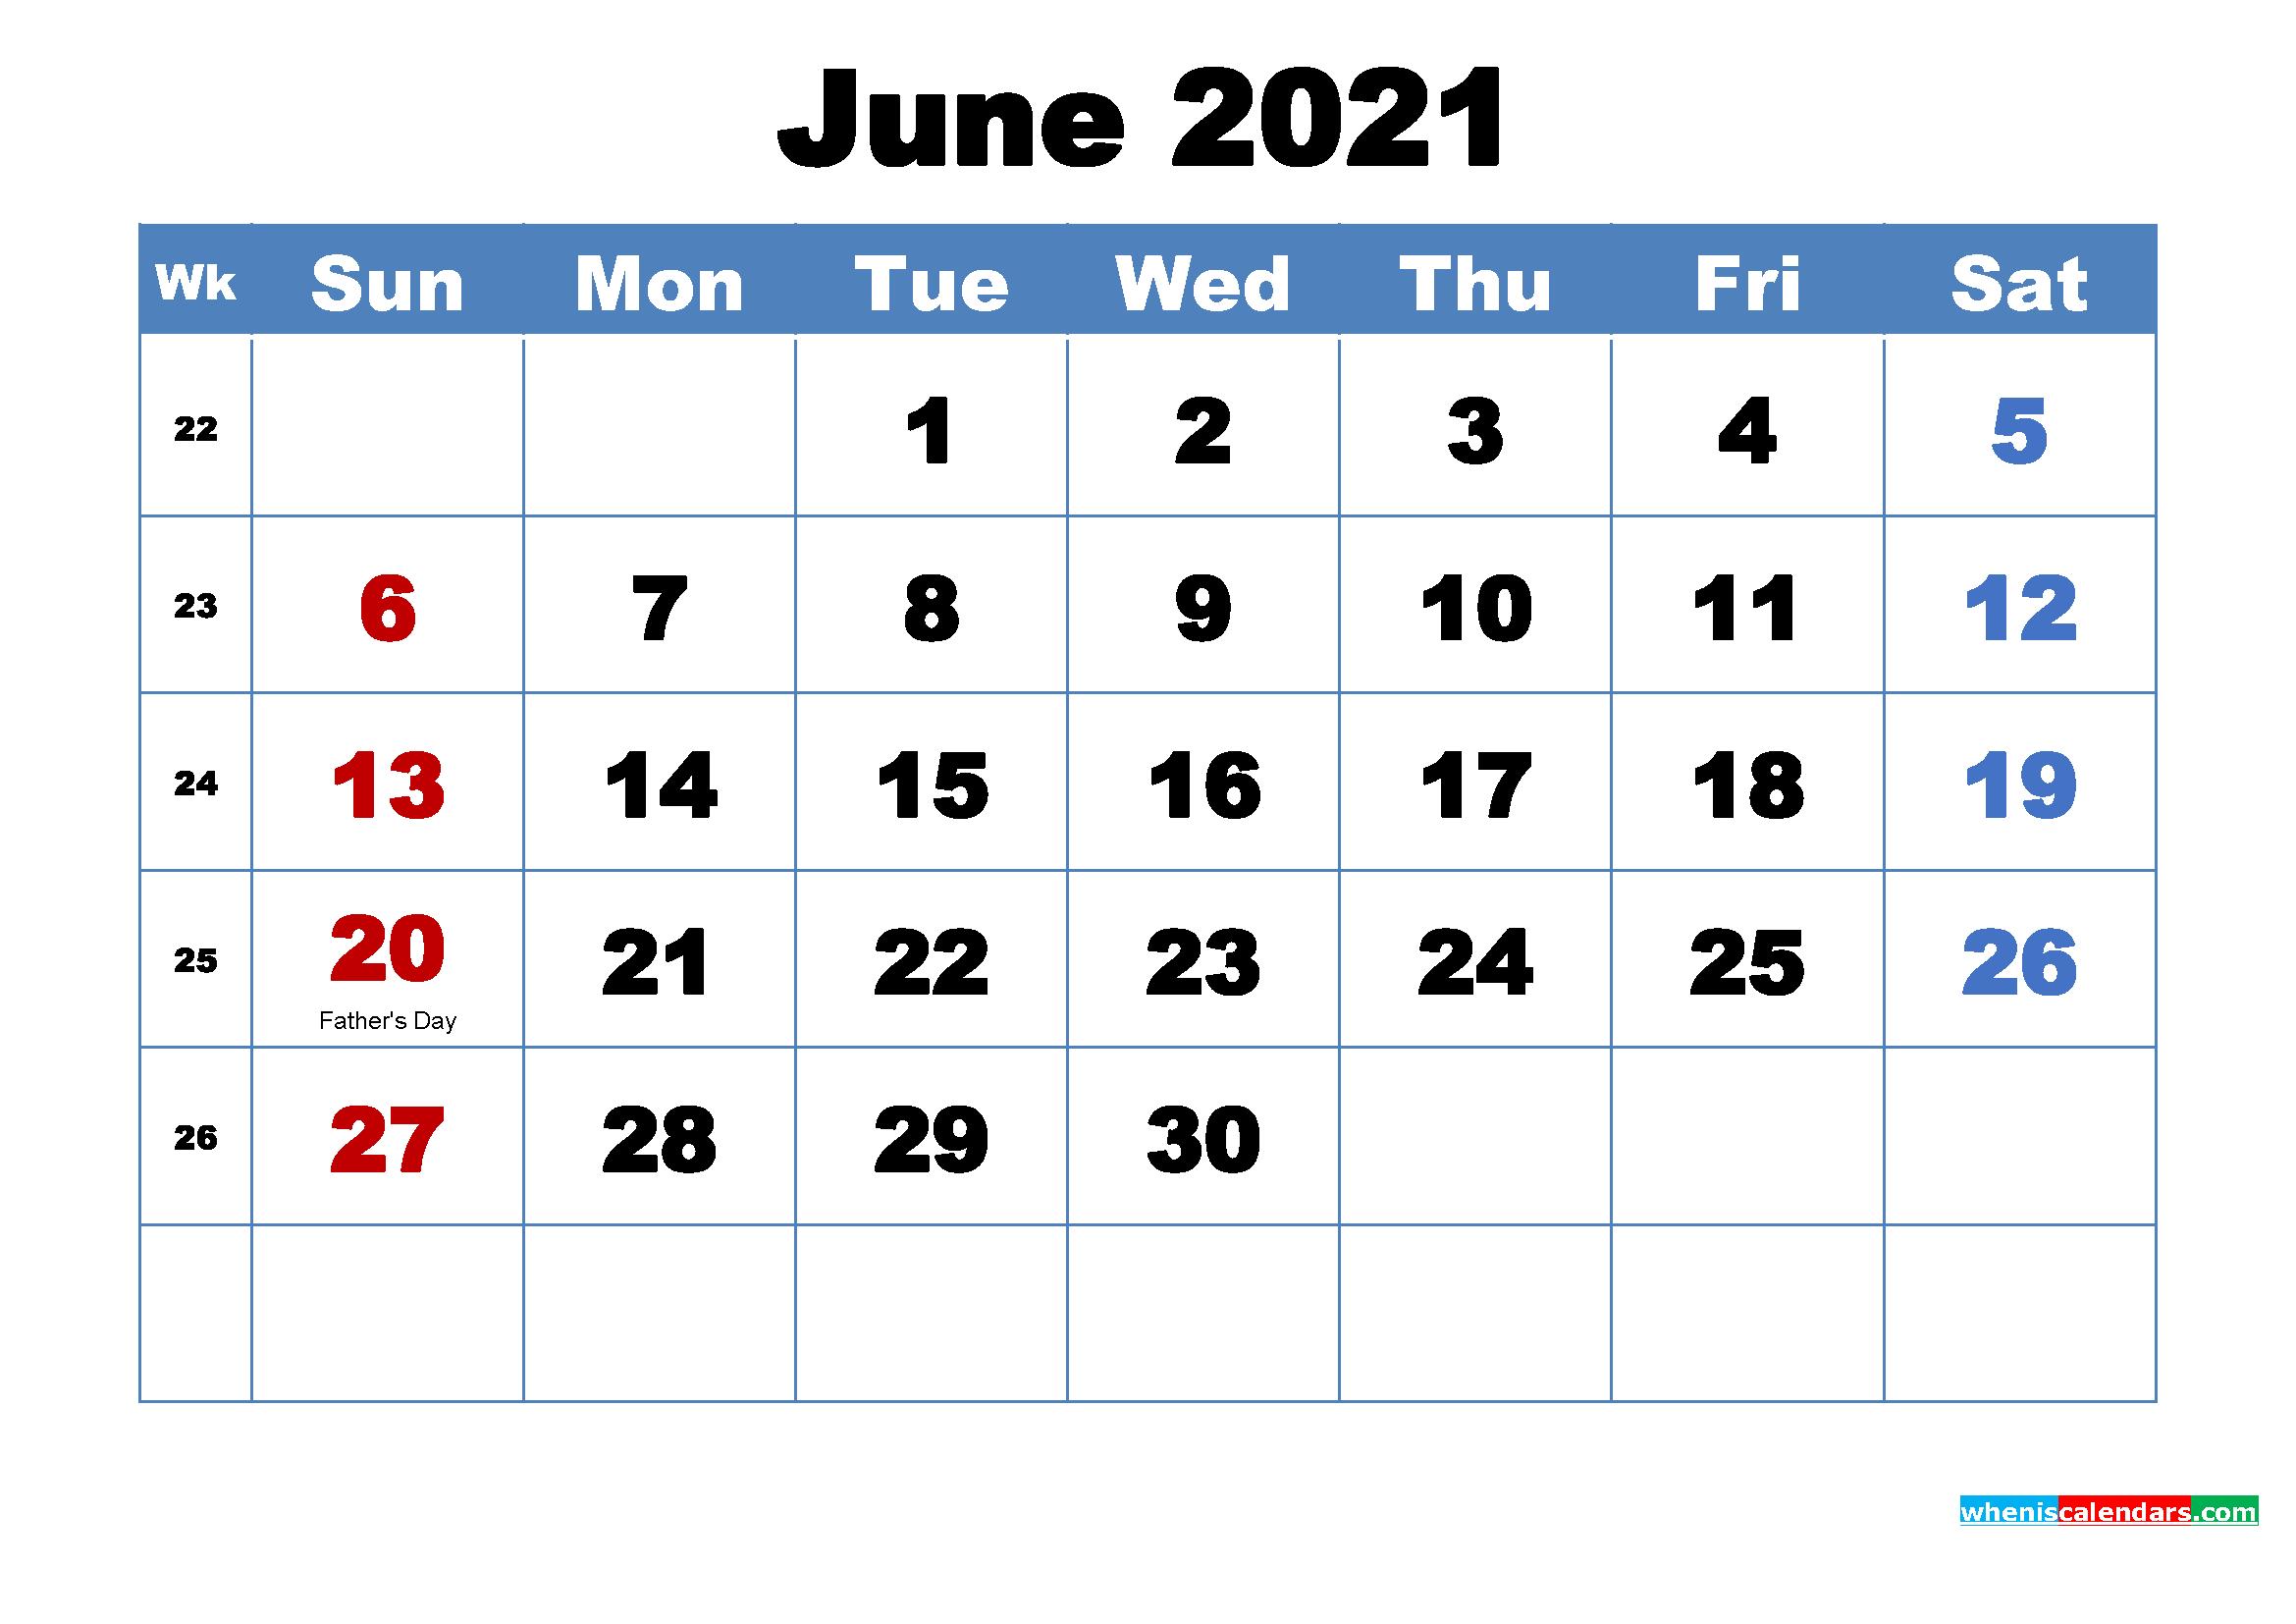 free printable june 2021 calendar with holidays